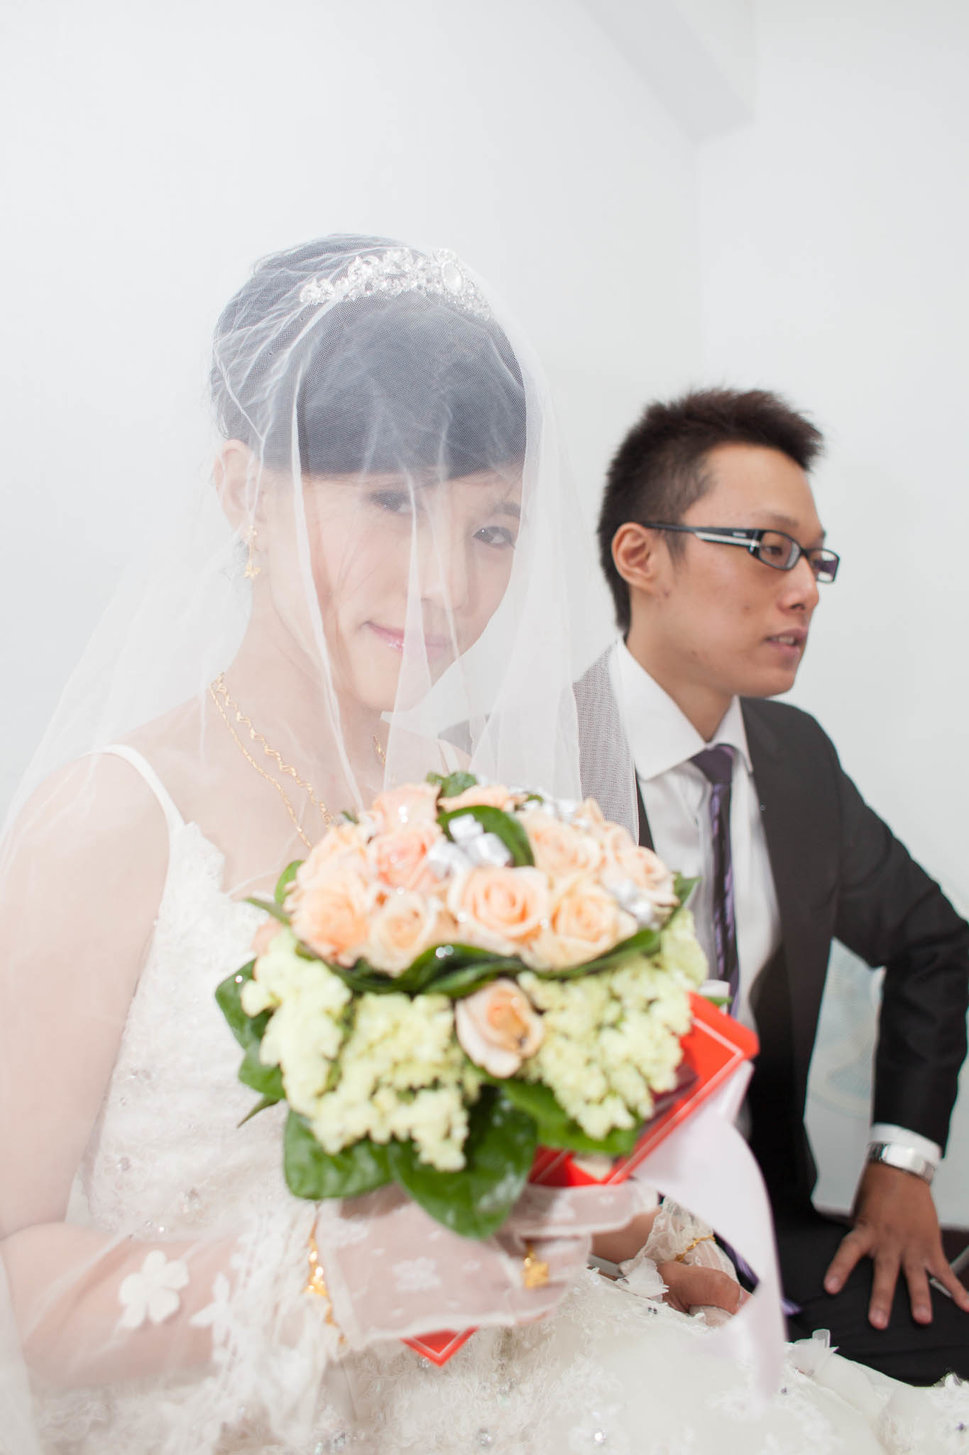 18PHOTO-青蛙王子娶新娘❤️(編號:218623) - 18 PHOTO 影像攝影工作室 - 結婚吧一站式婚禮服務平台